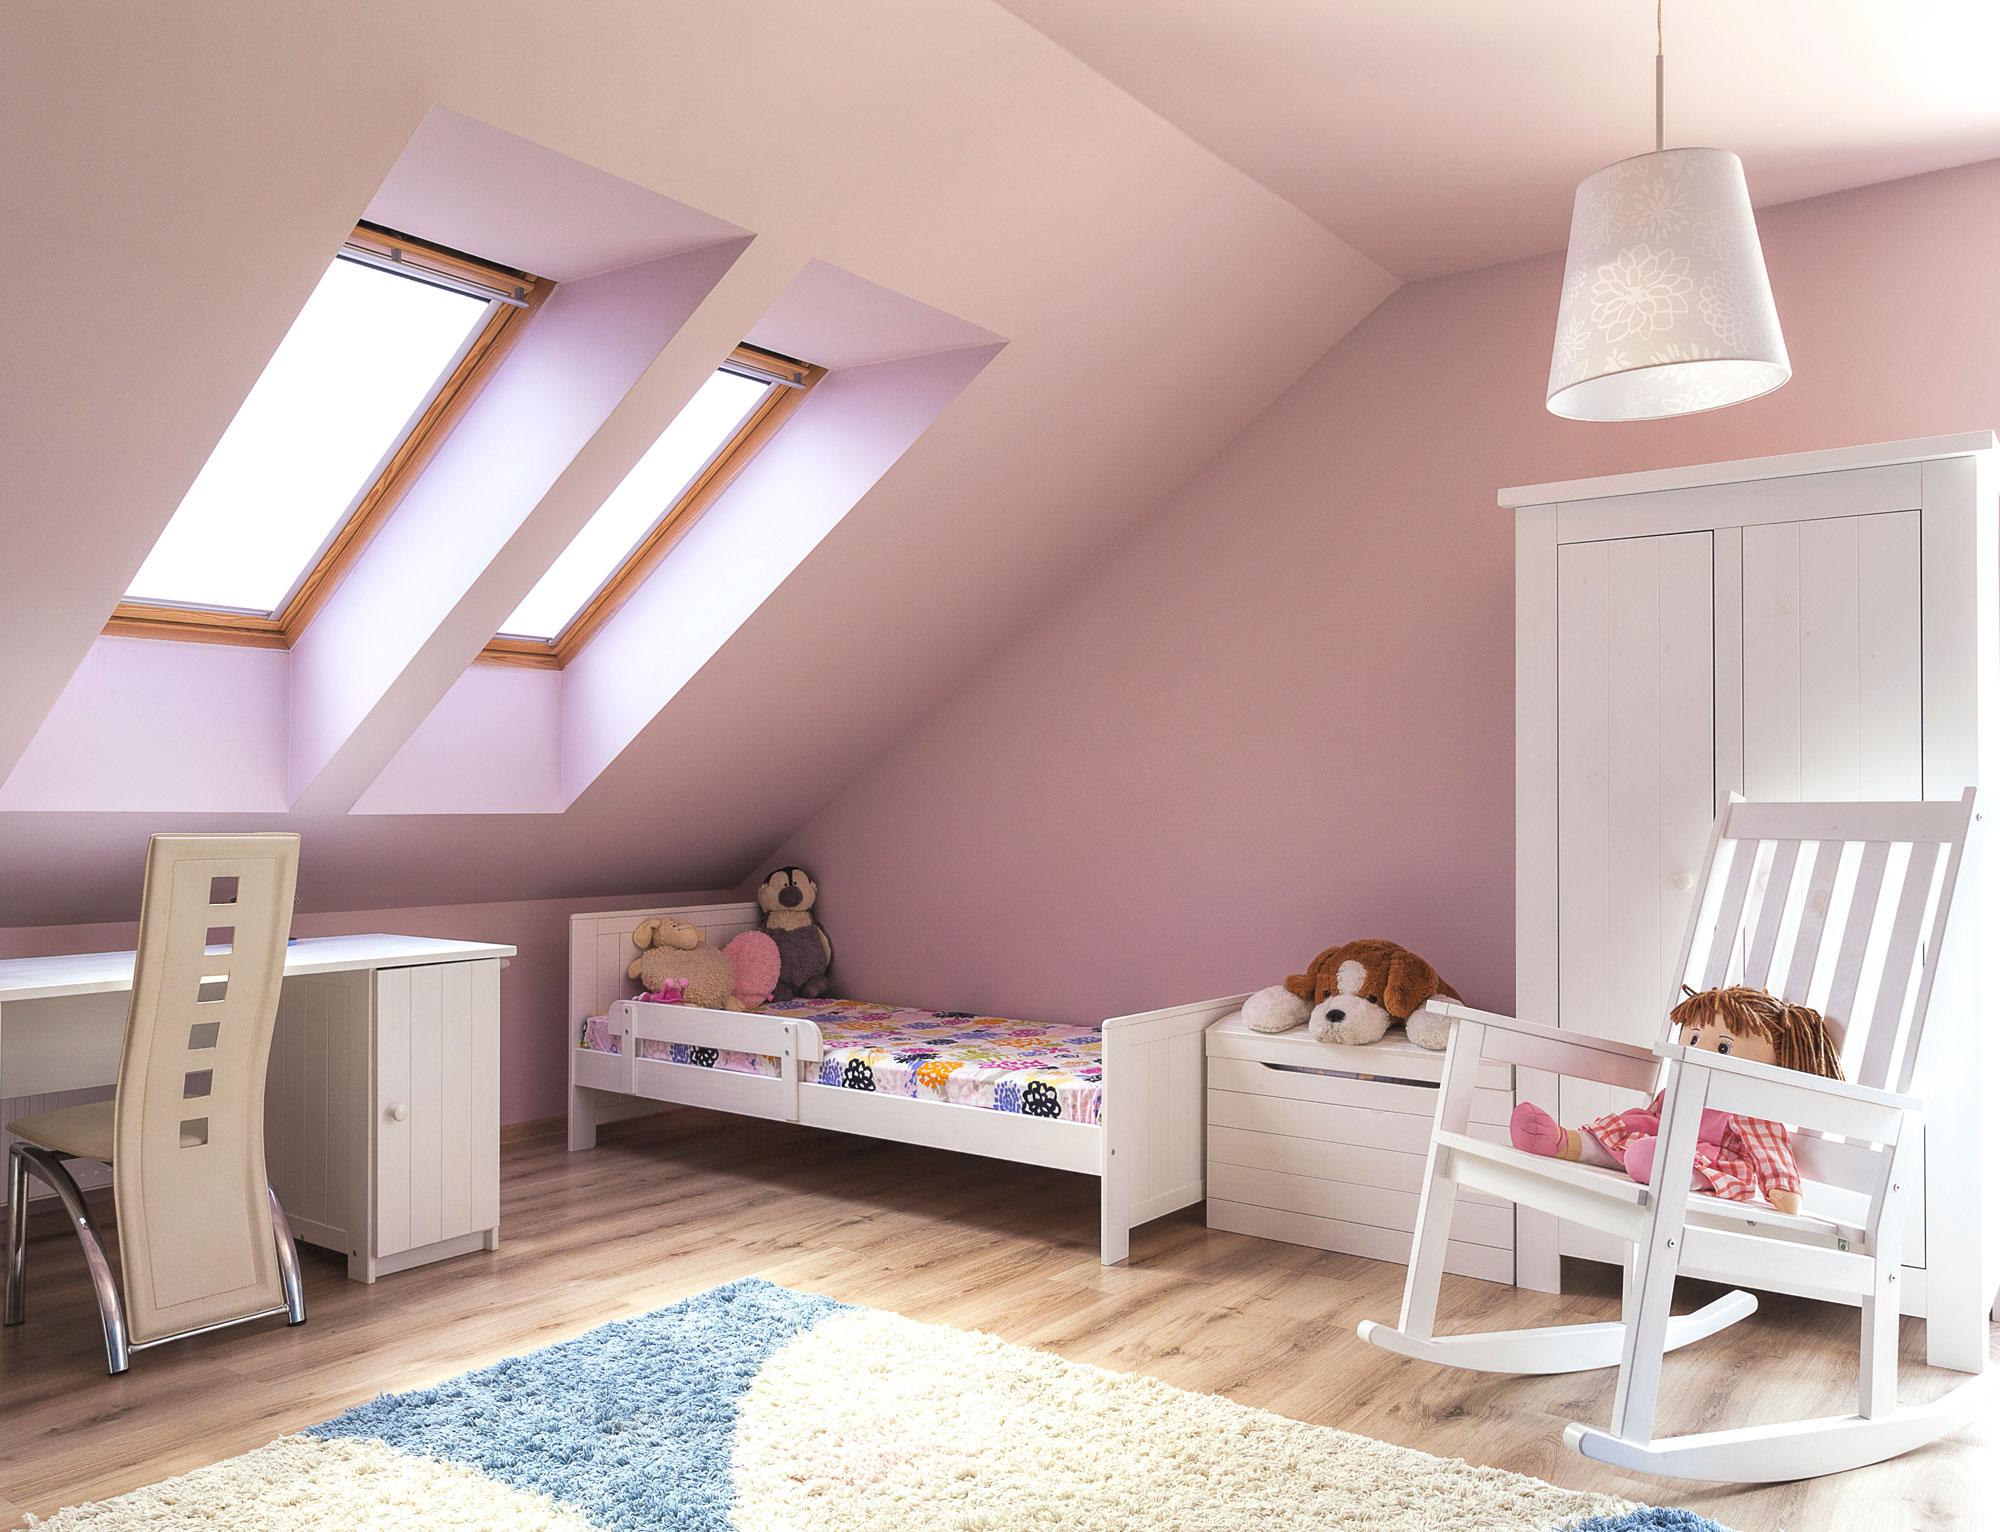 iluminaci n en habitaciones infantiles hogarmania. Black Bedroom Furniture Sets. Home Design Ideas